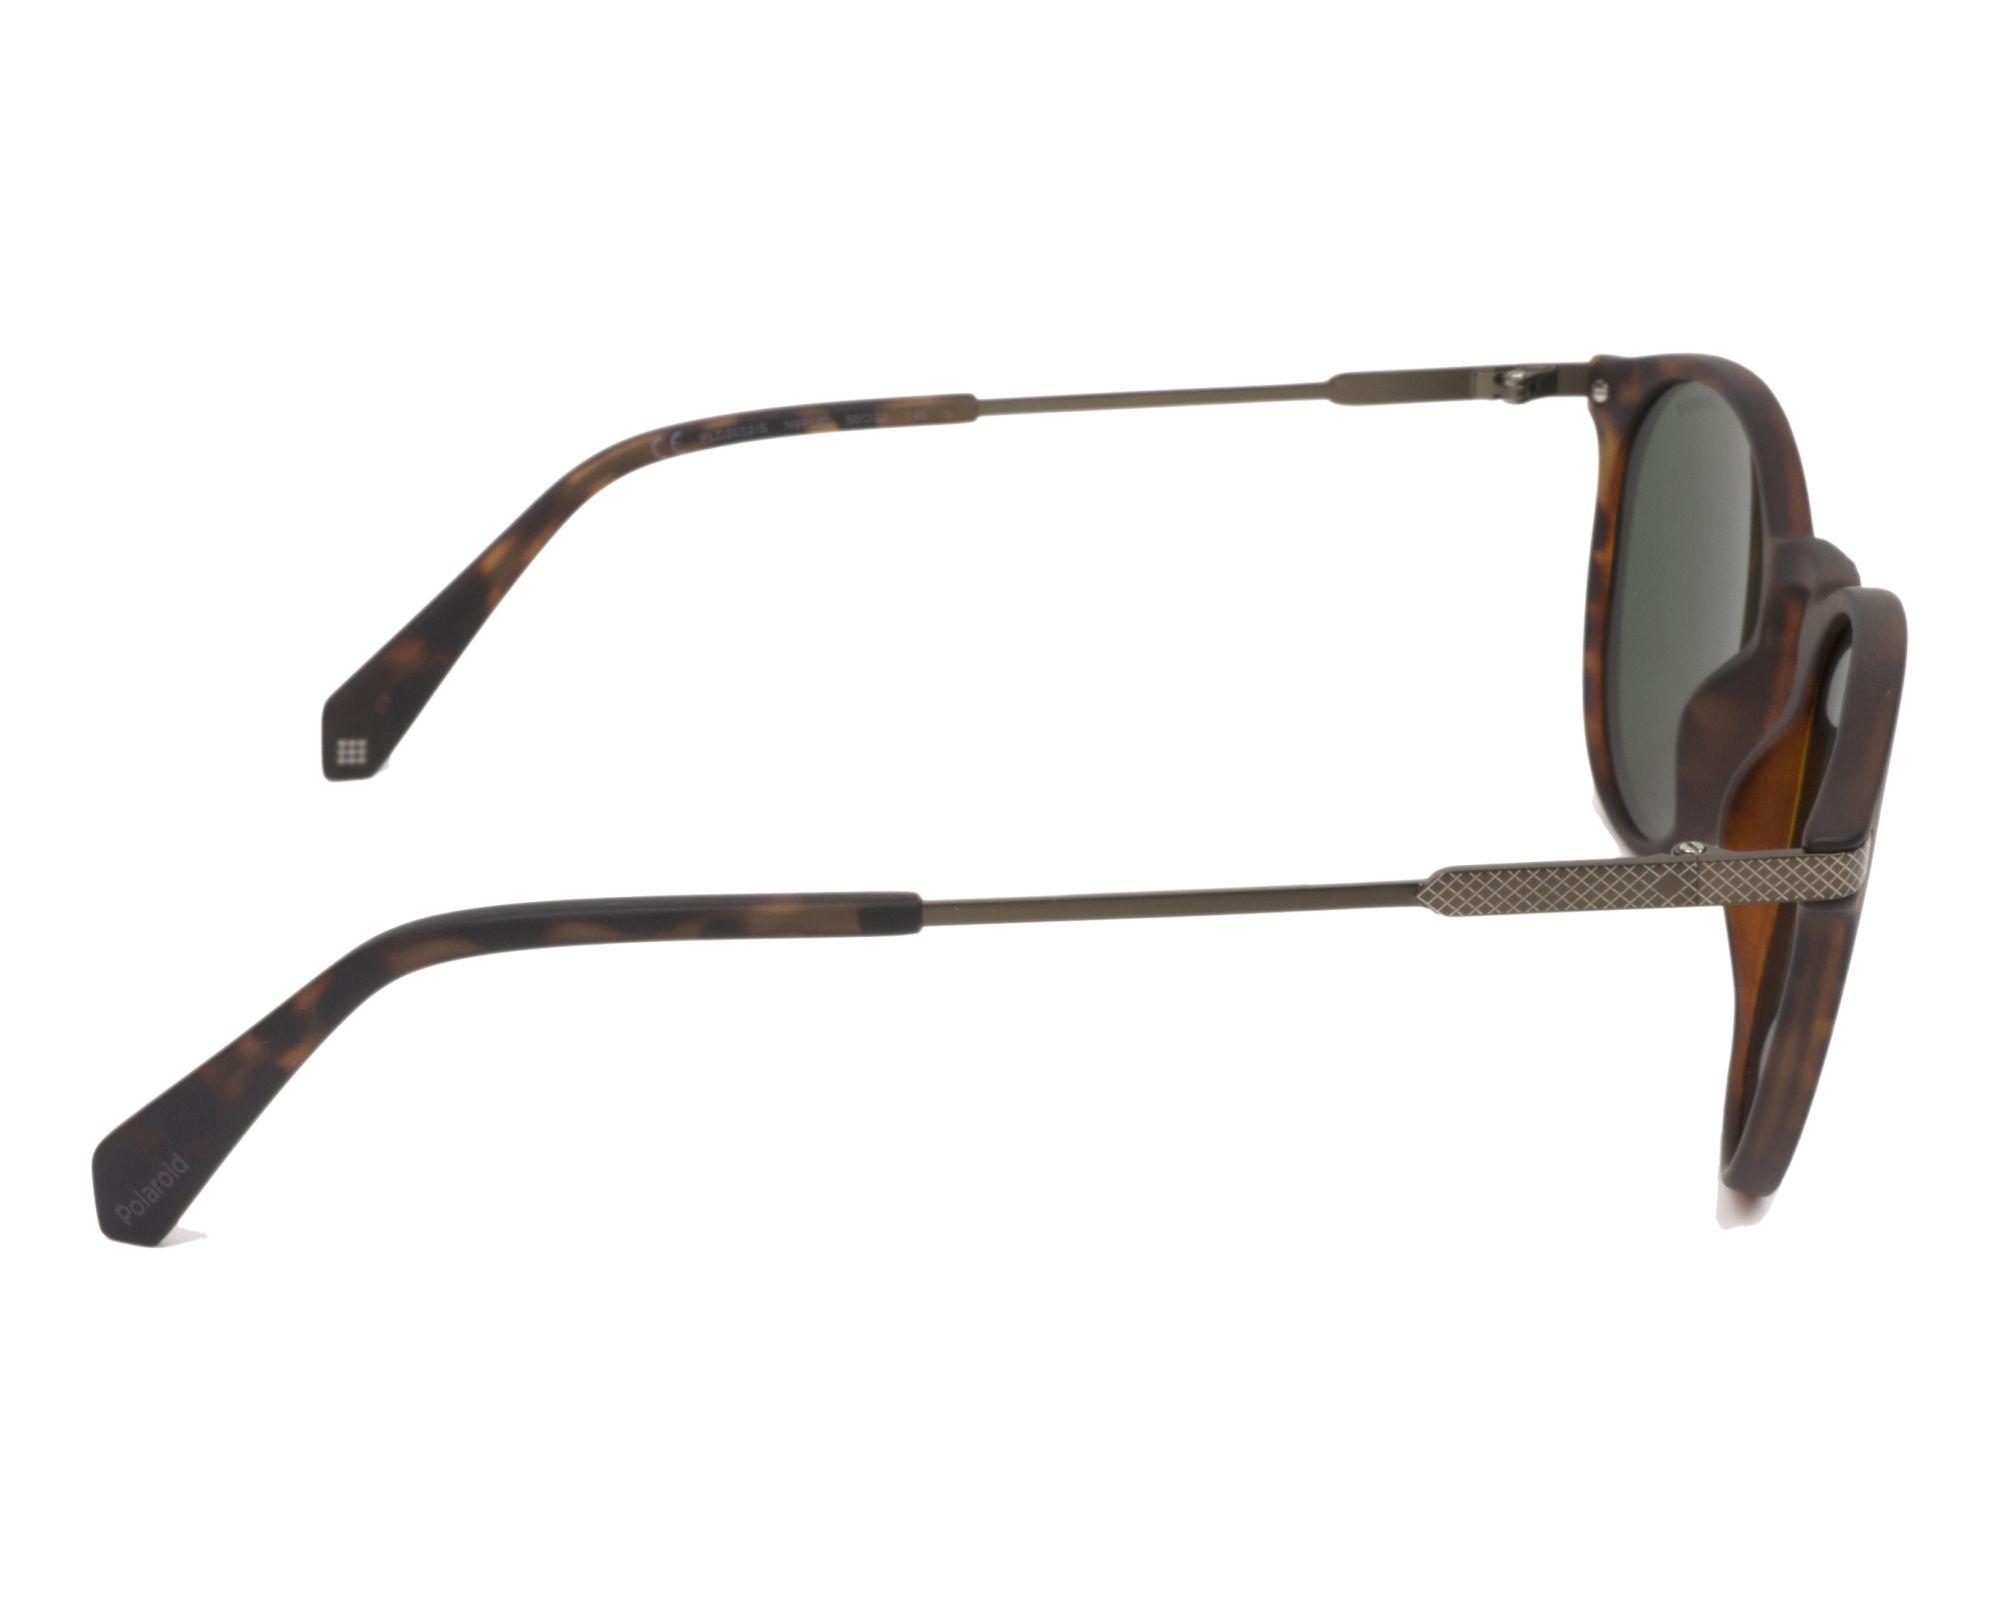 d40b10f266e Sunglasses Polaroid PLD-2062-S N9P UC 50-22 Havana Brass side